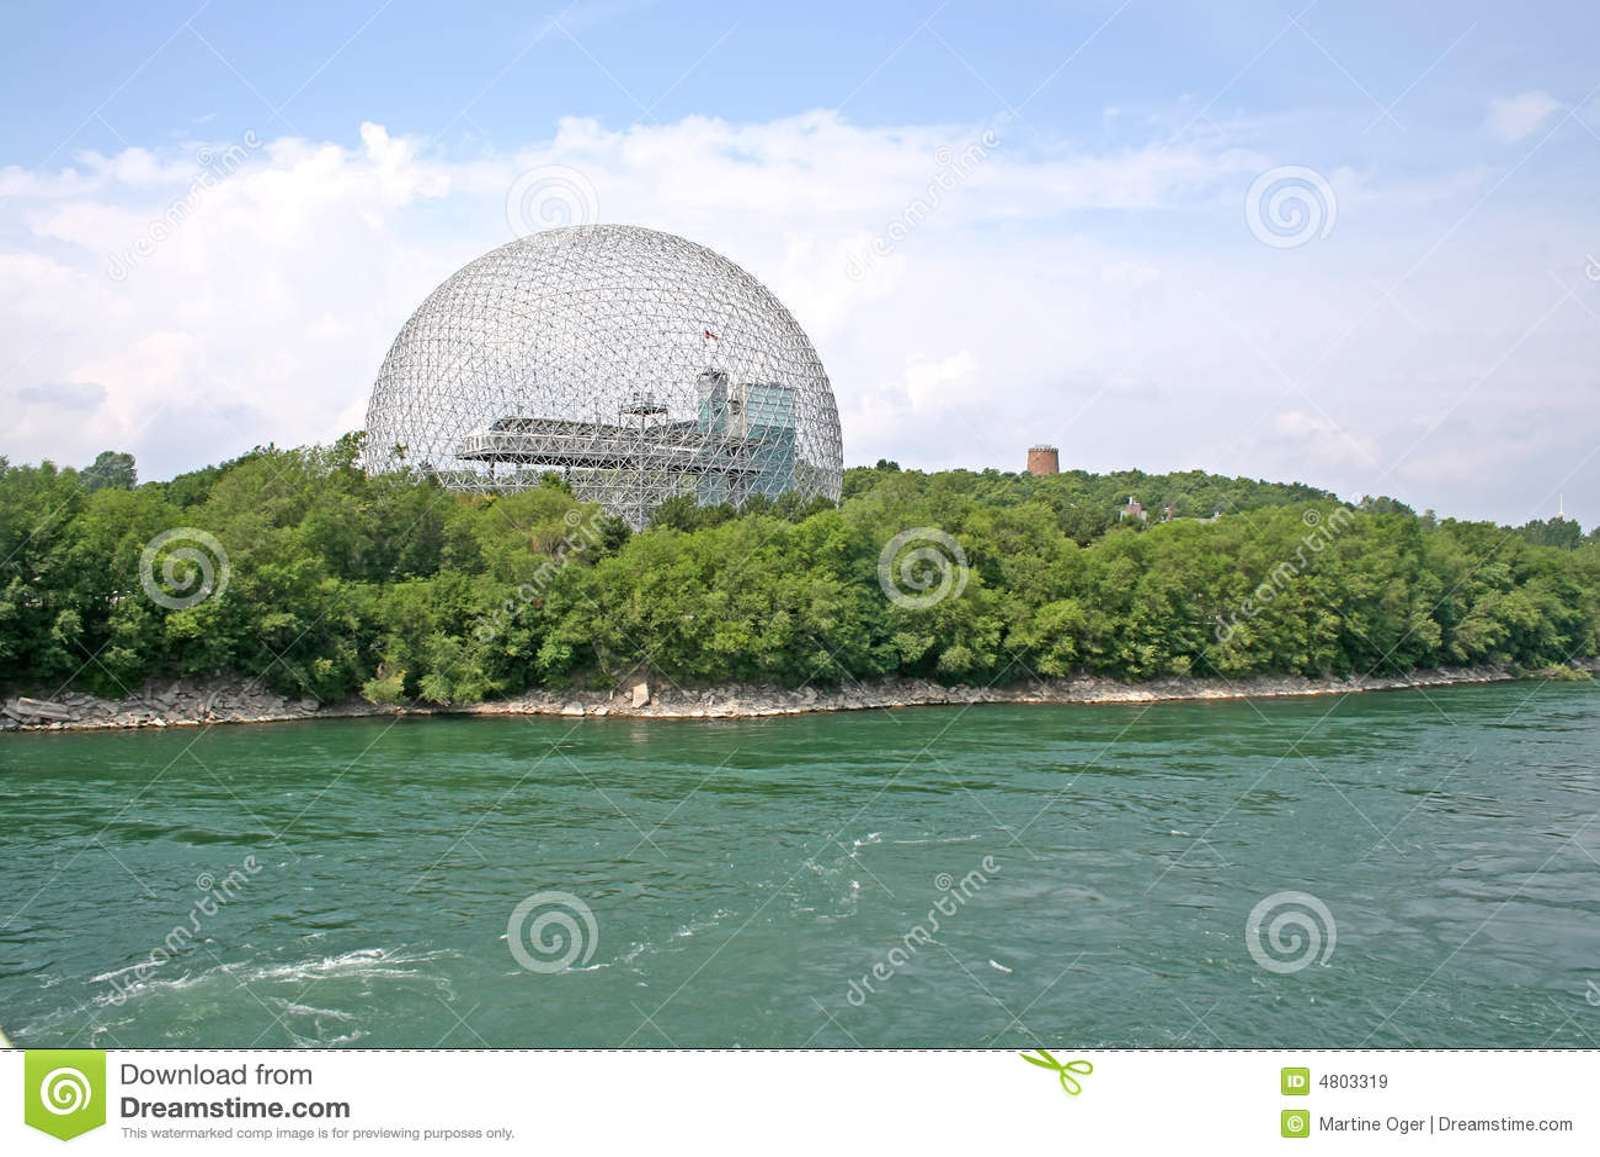 The Biosphere.